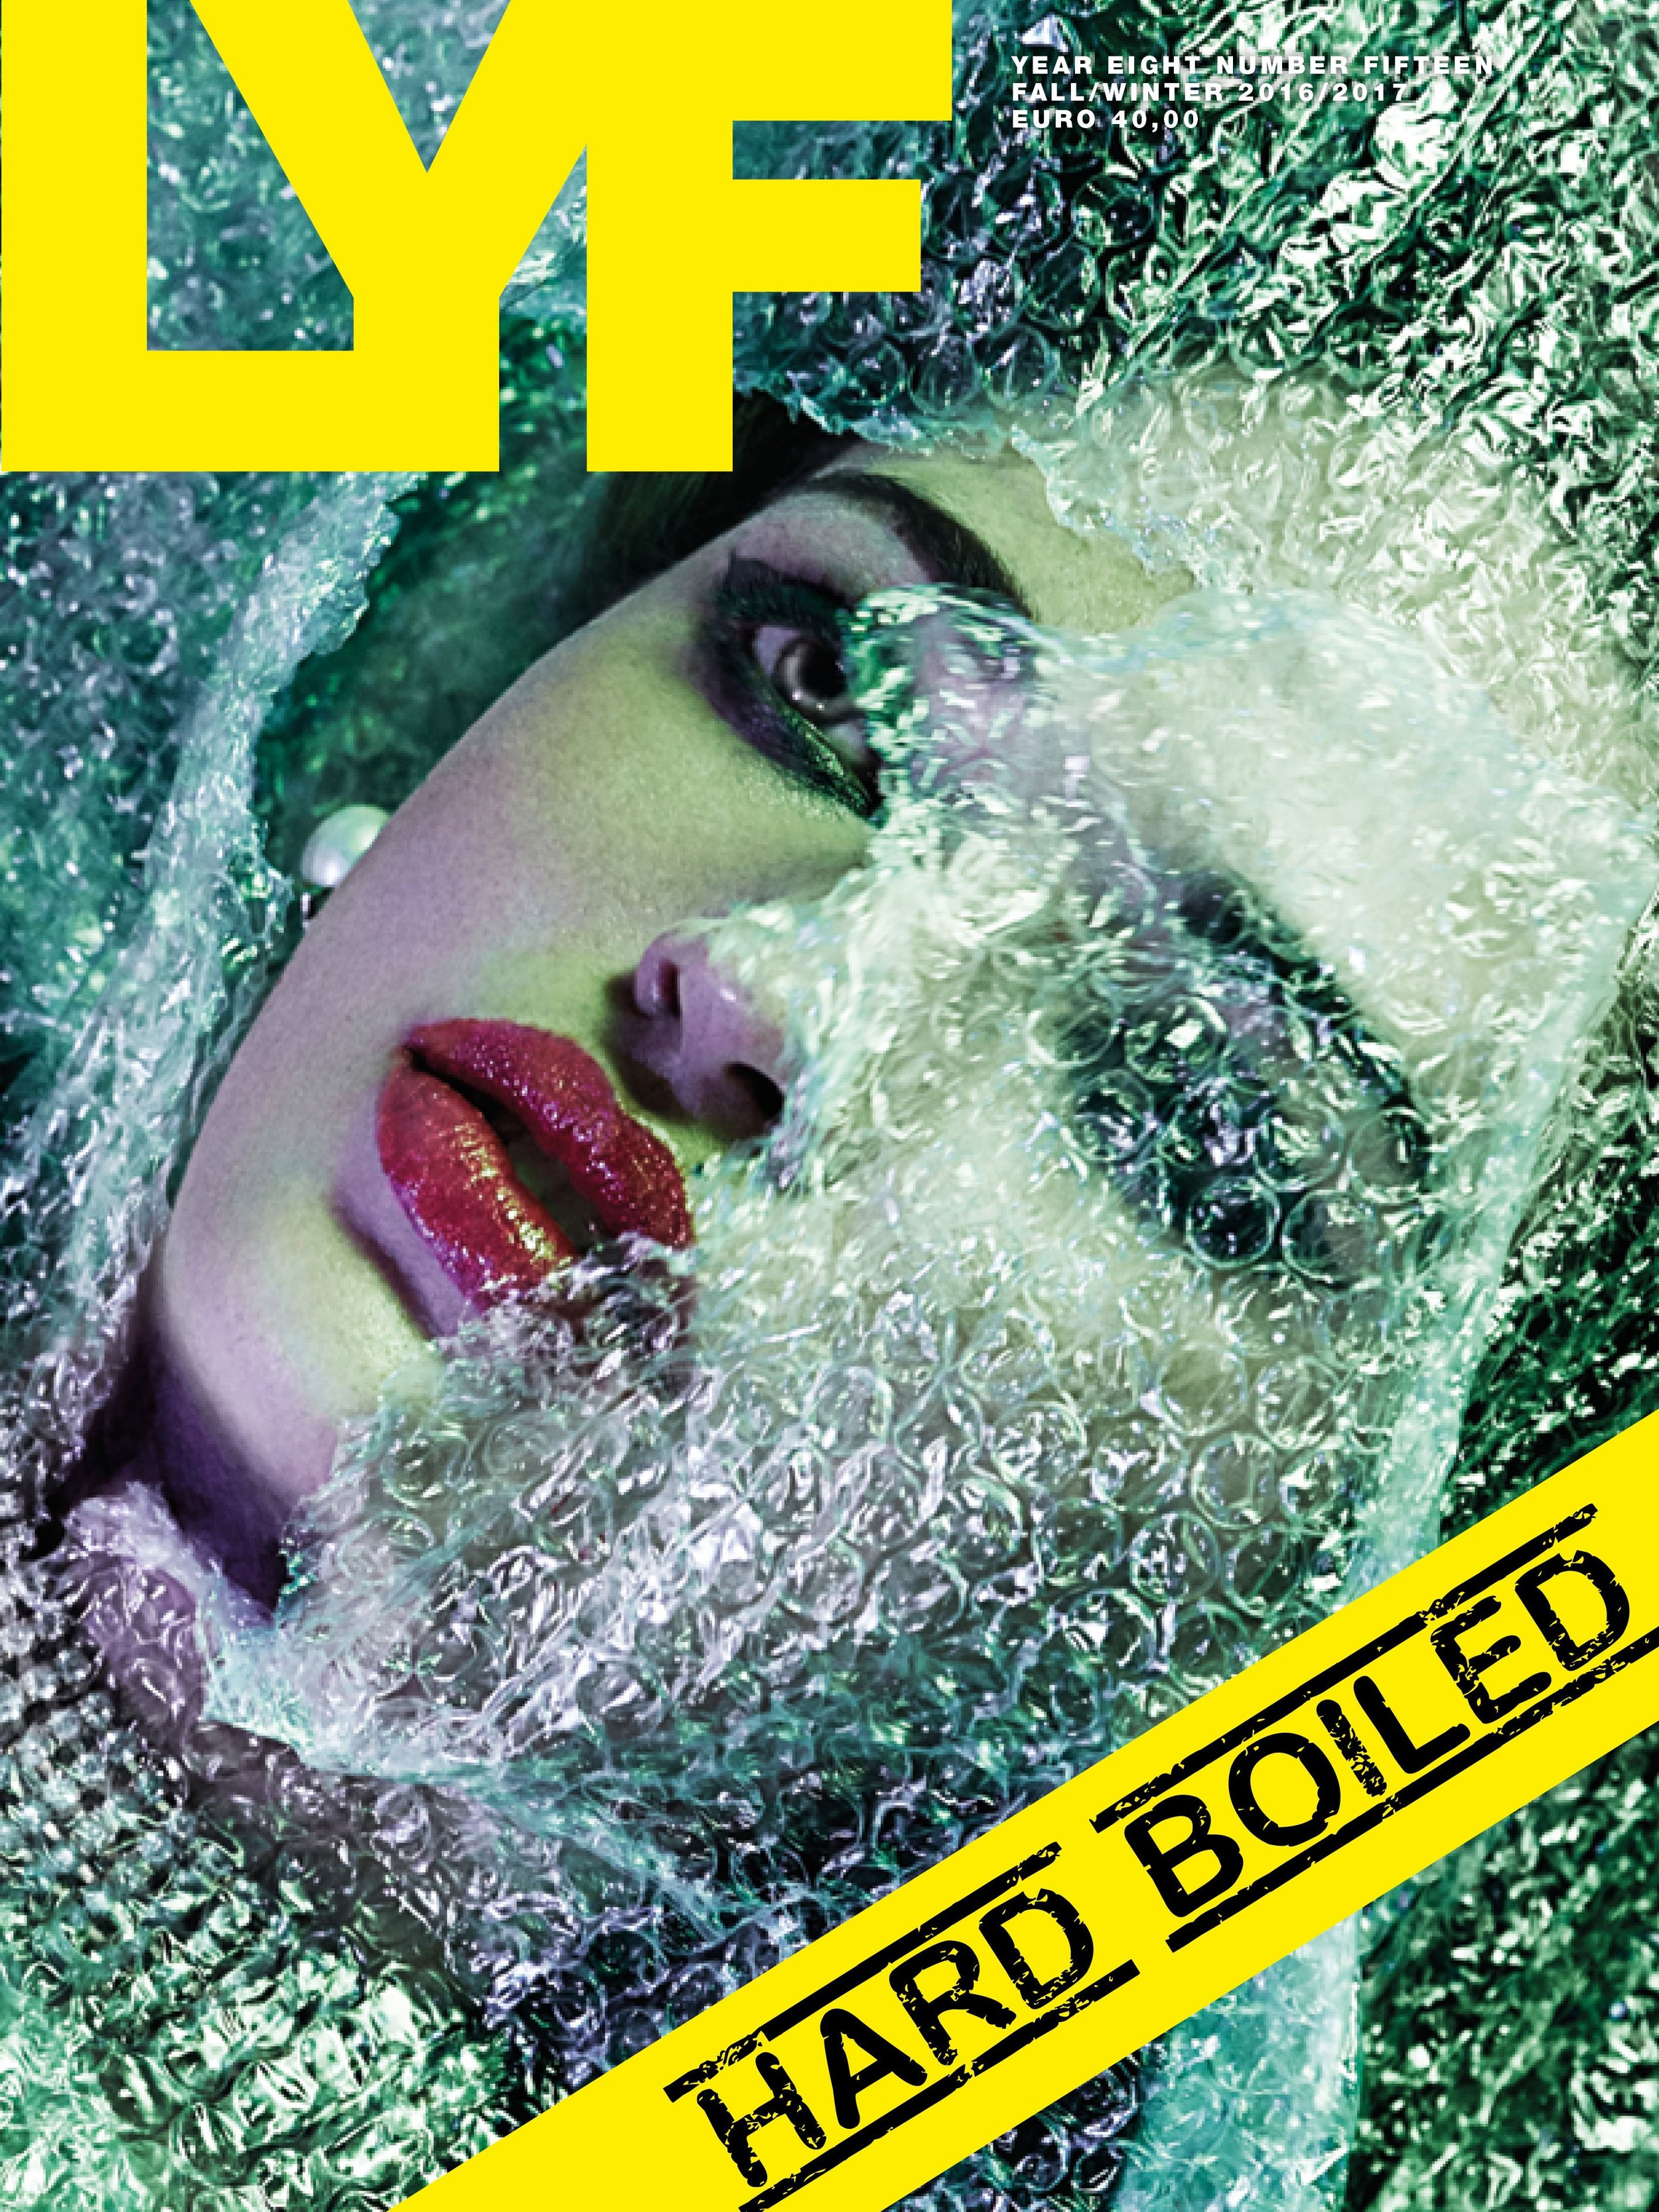 Lyf Magazine Hardboiled